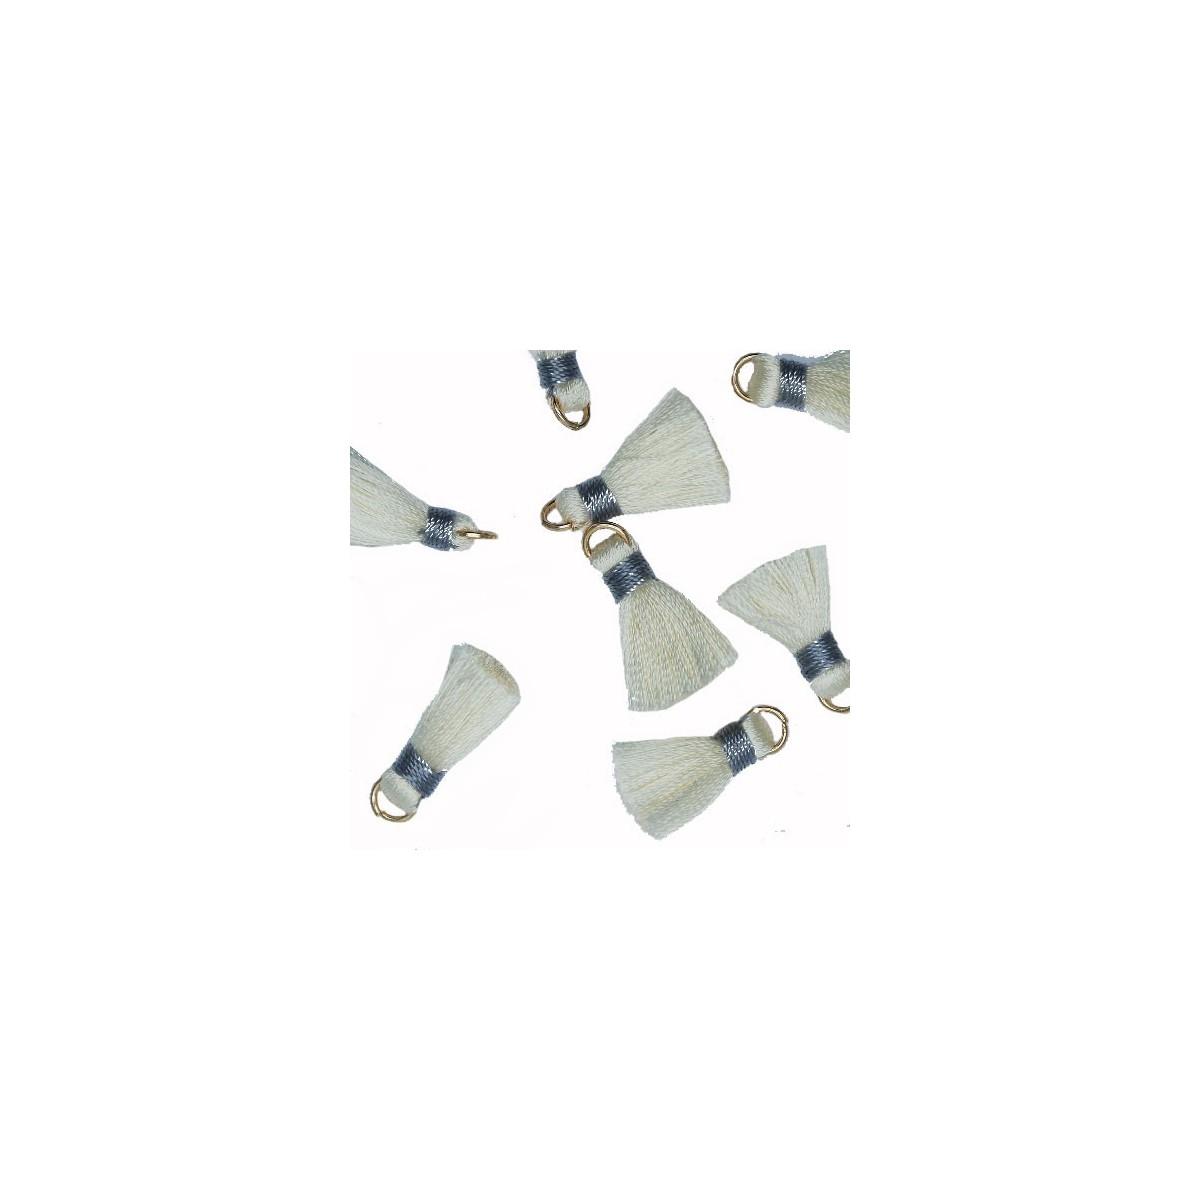 Nappina panna e grigio 18 mm 5pz